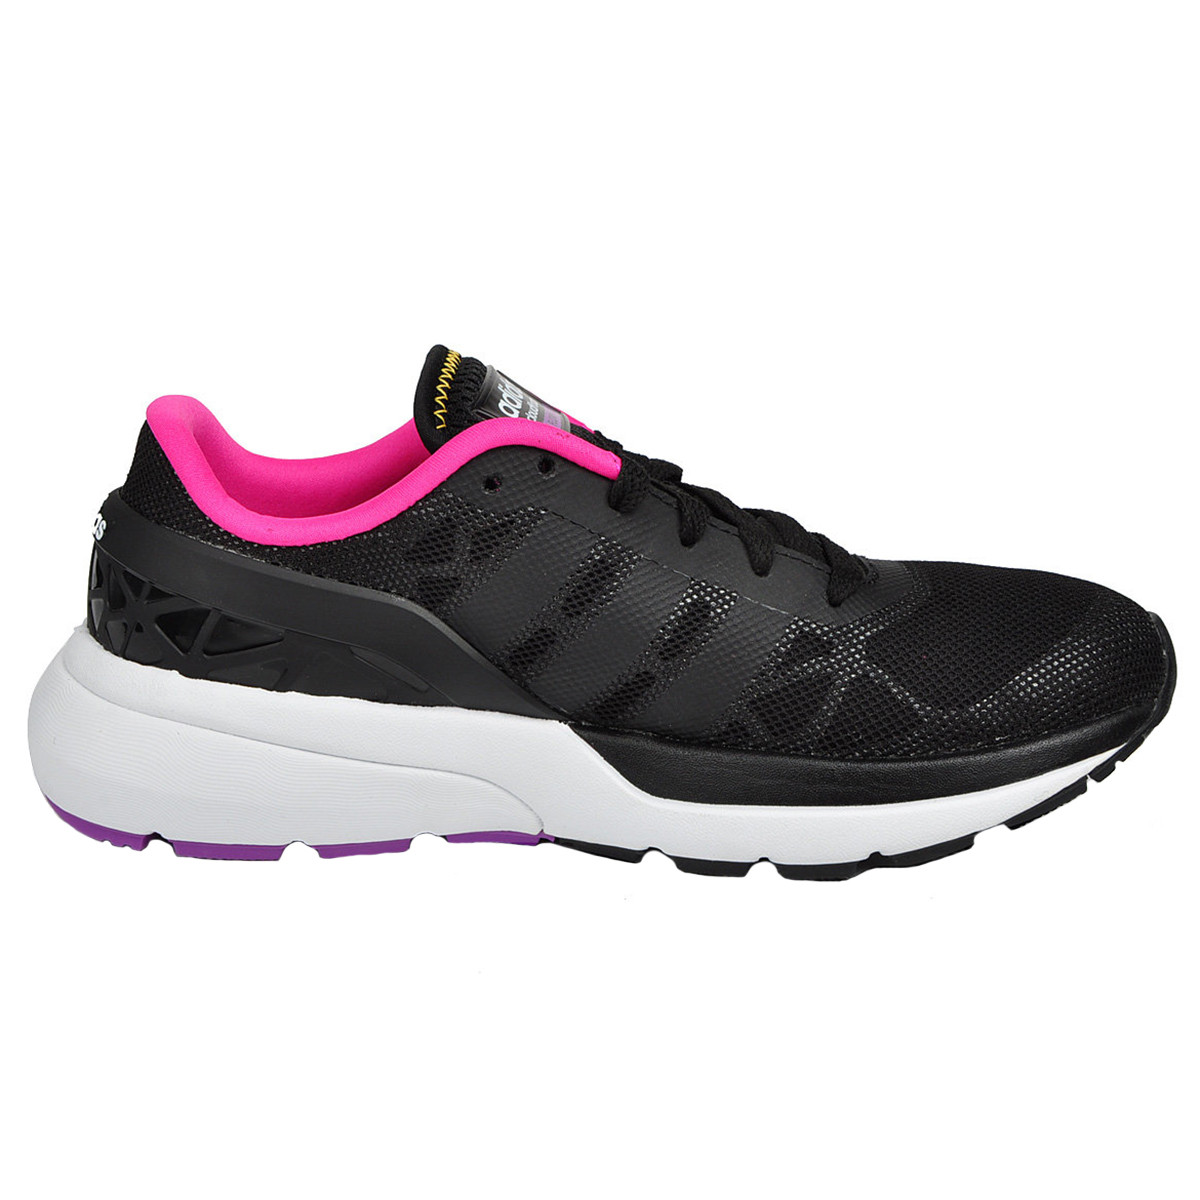 chaussure adidas basse femme pas cher